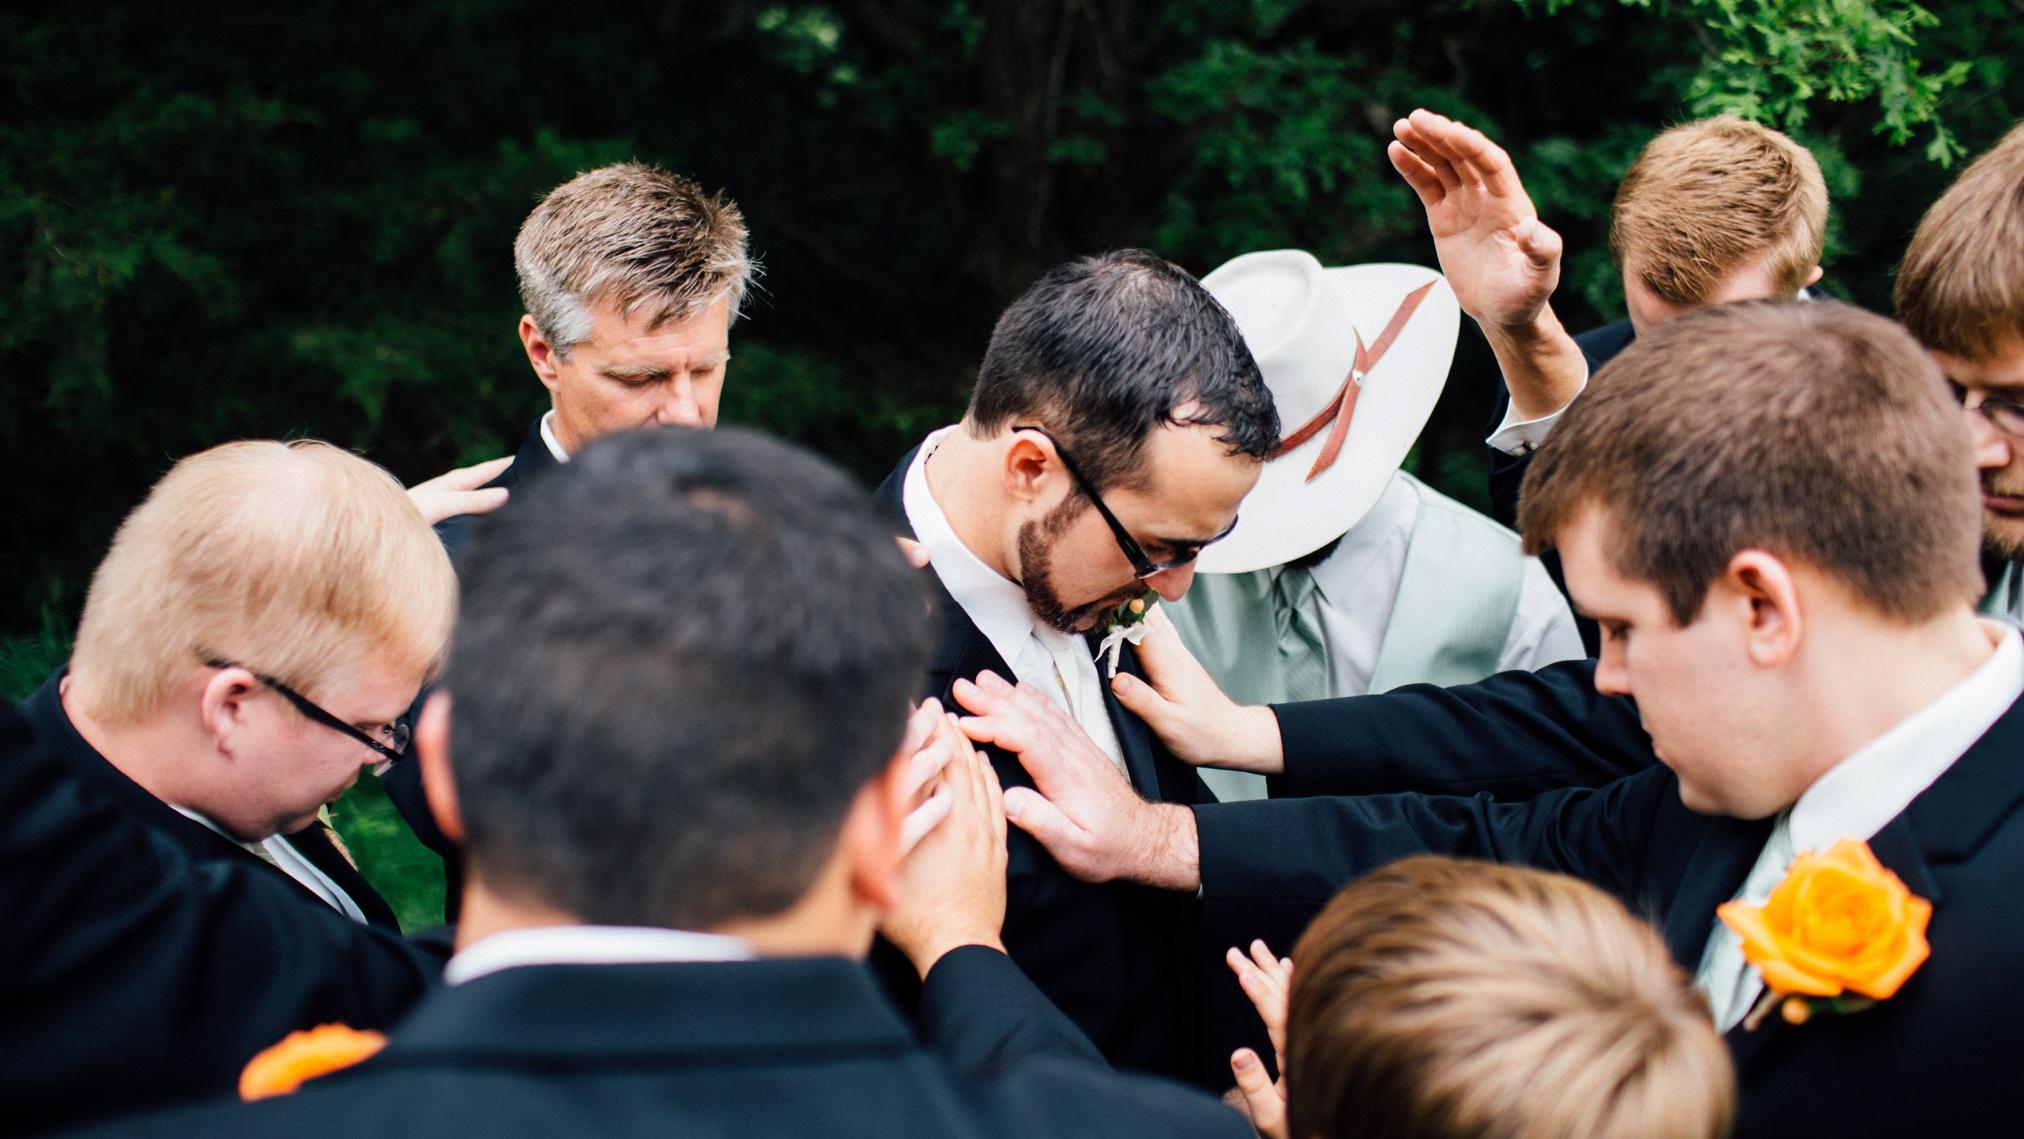 schmid_wedding-243.jpg